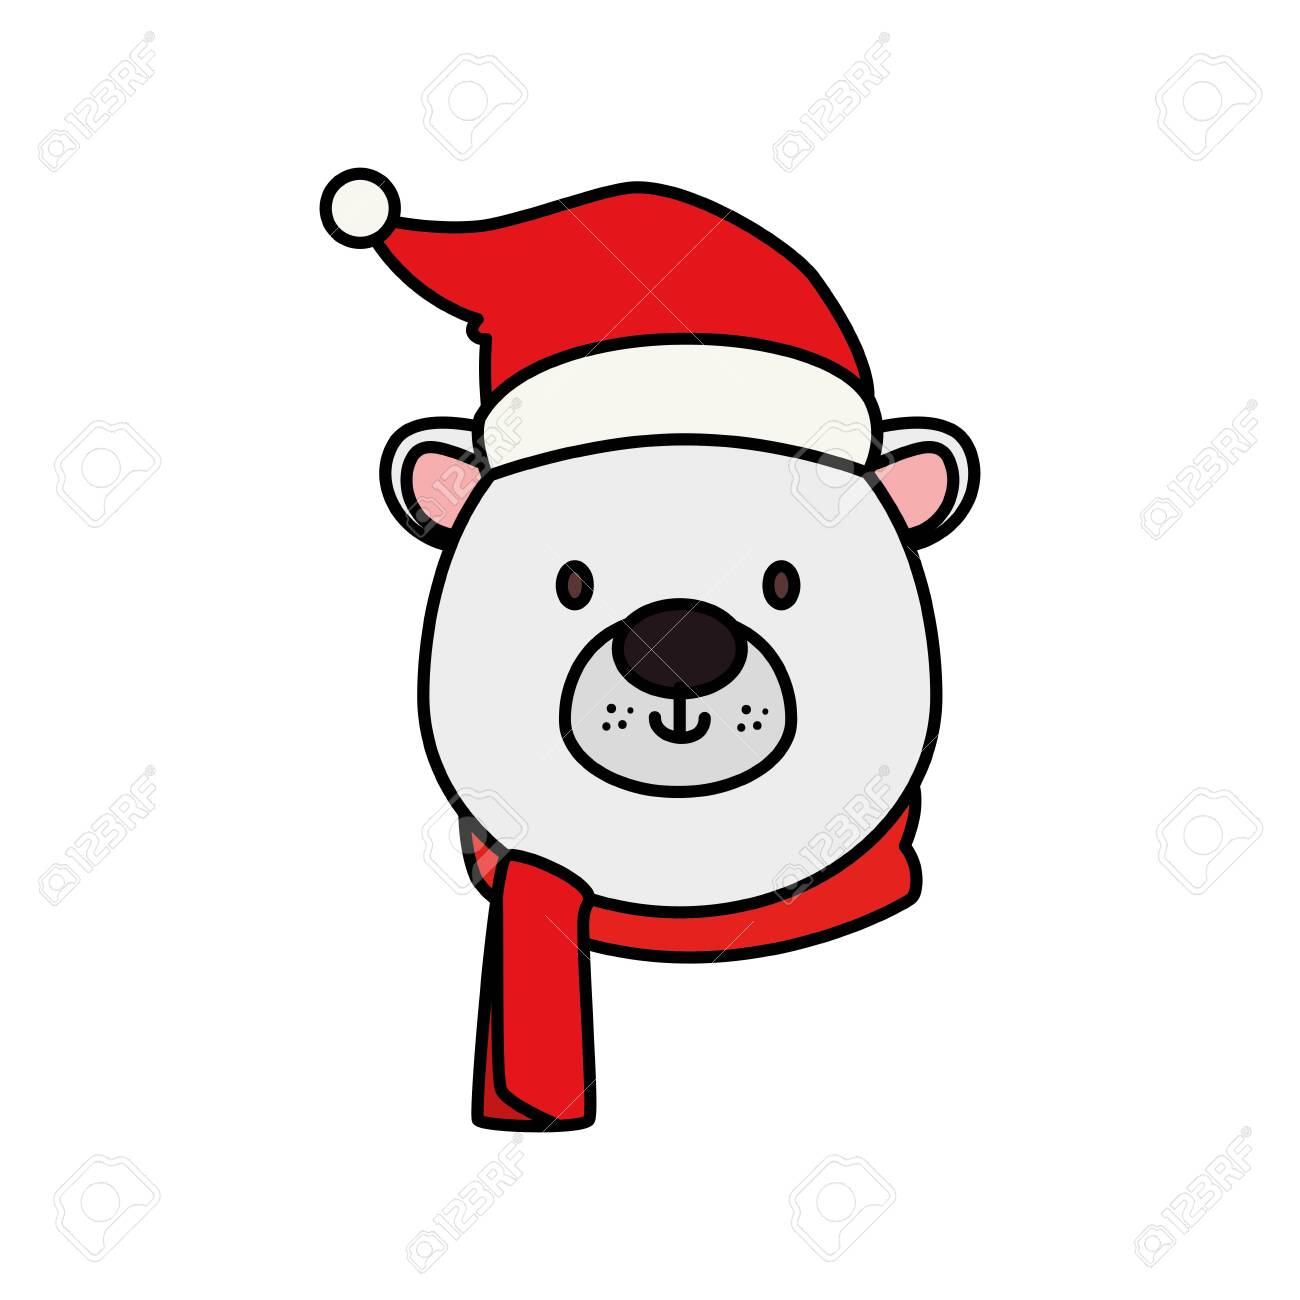 head of cute bear character merry christmas vector illustration design - 140202980